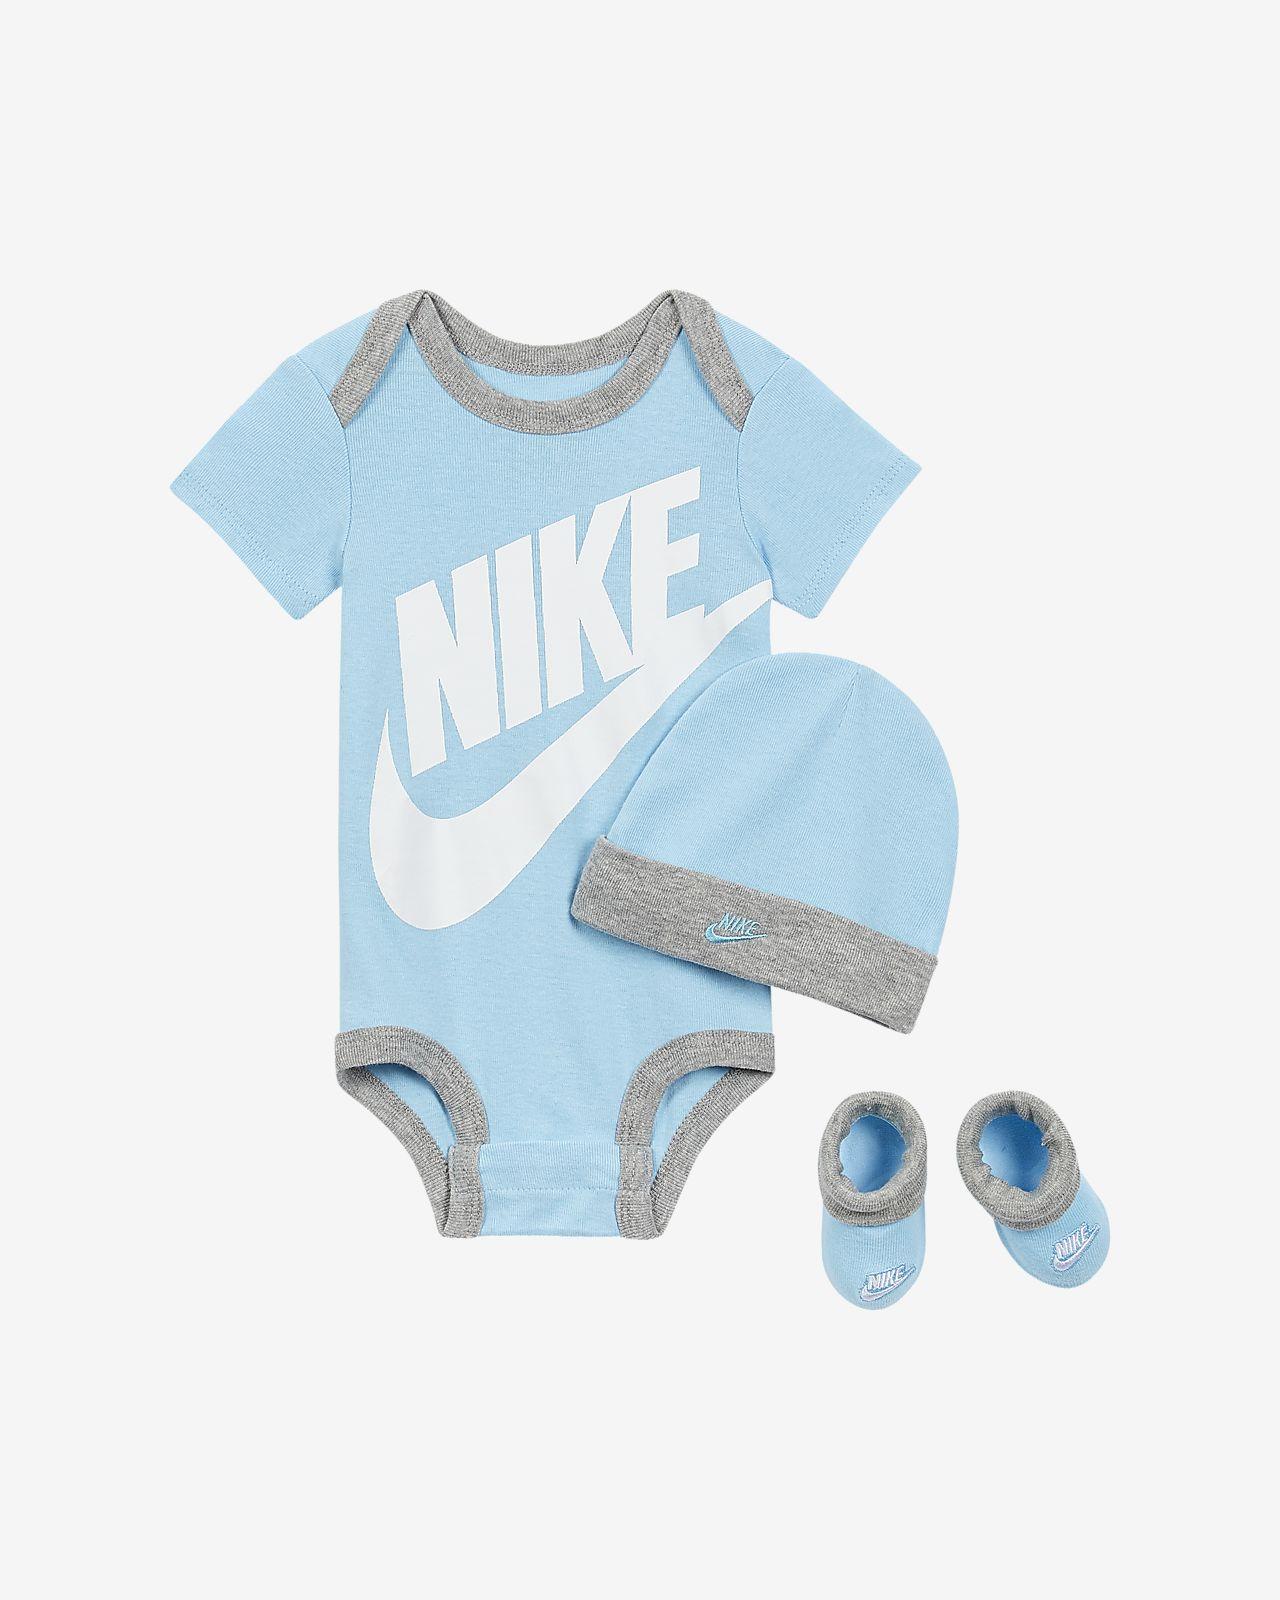 02afb1ba5 Nike Sportswear Infant 3-Piece Set. Nike.com